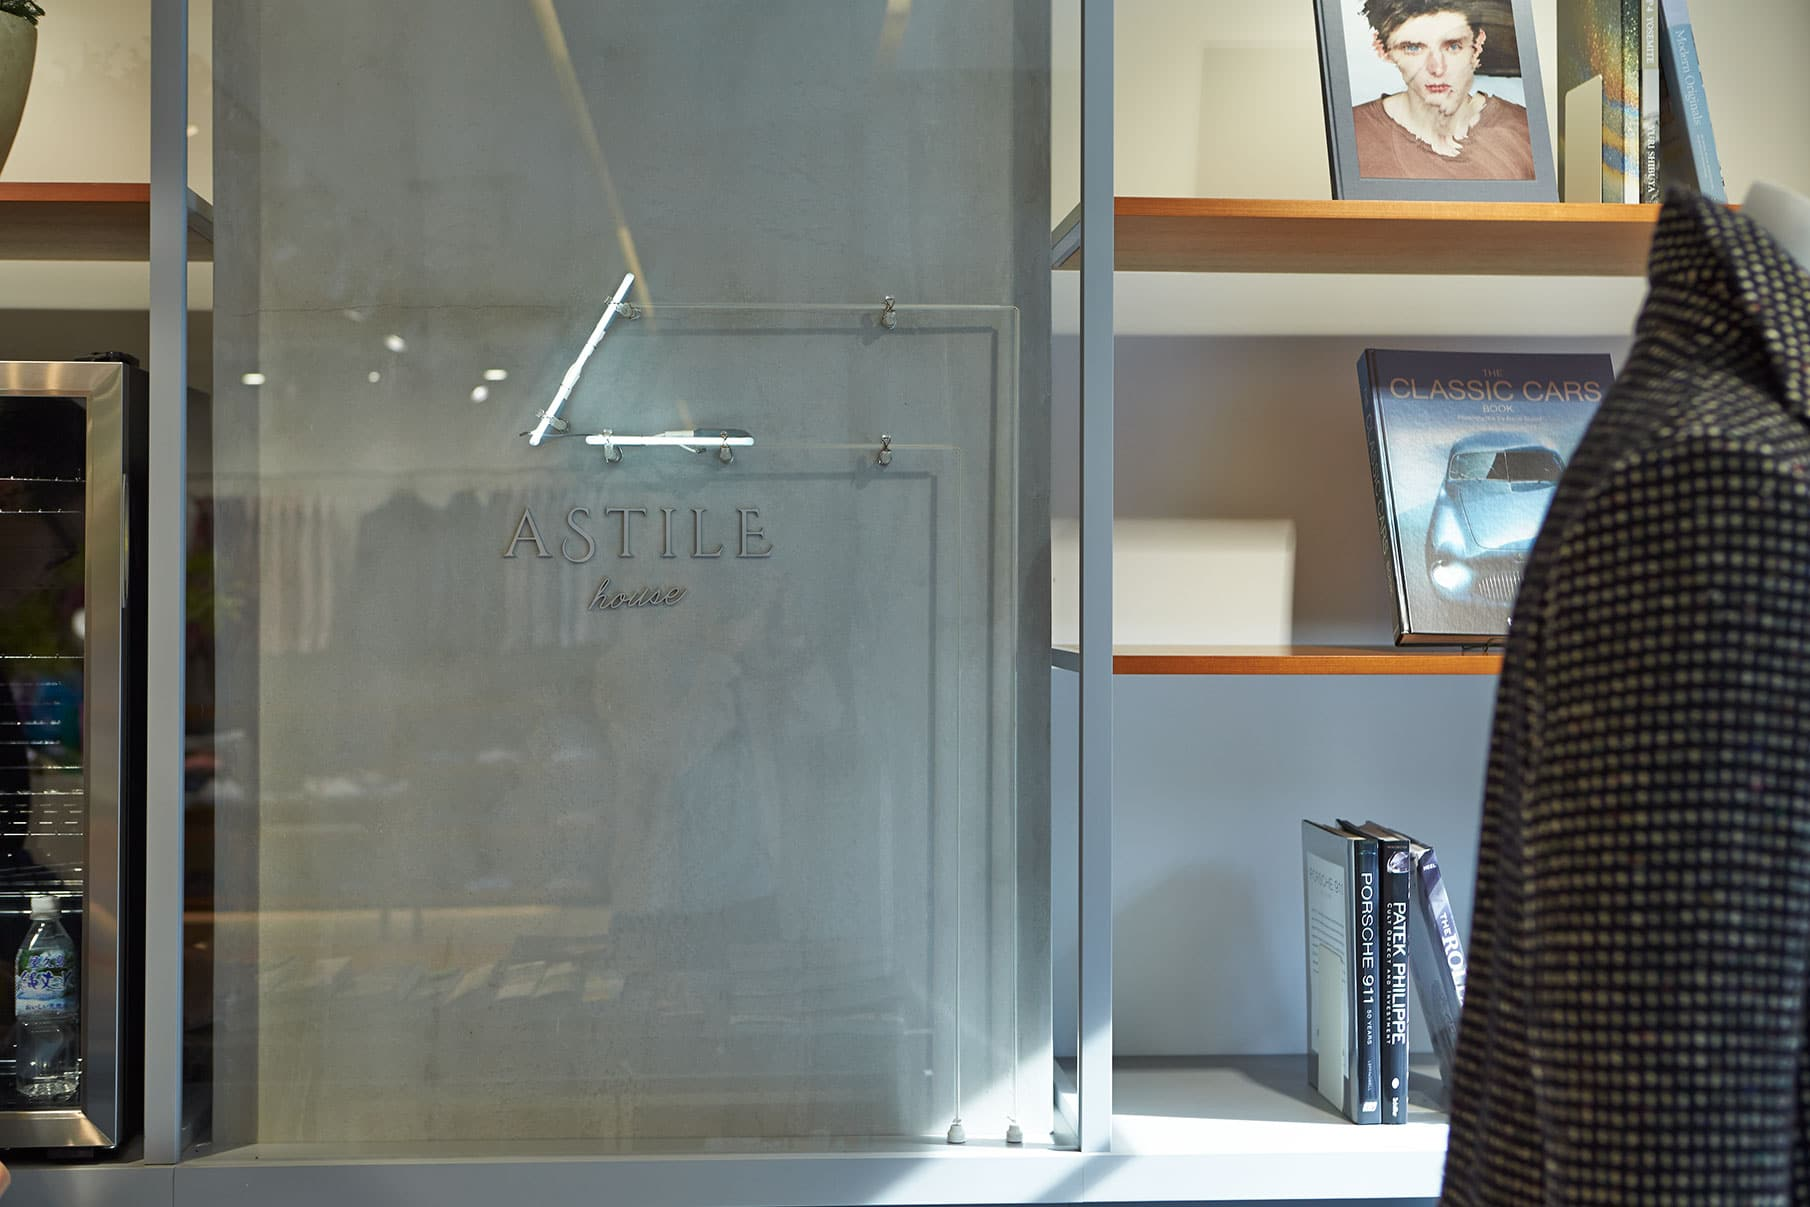 ASTILE house - Brand Identity 4